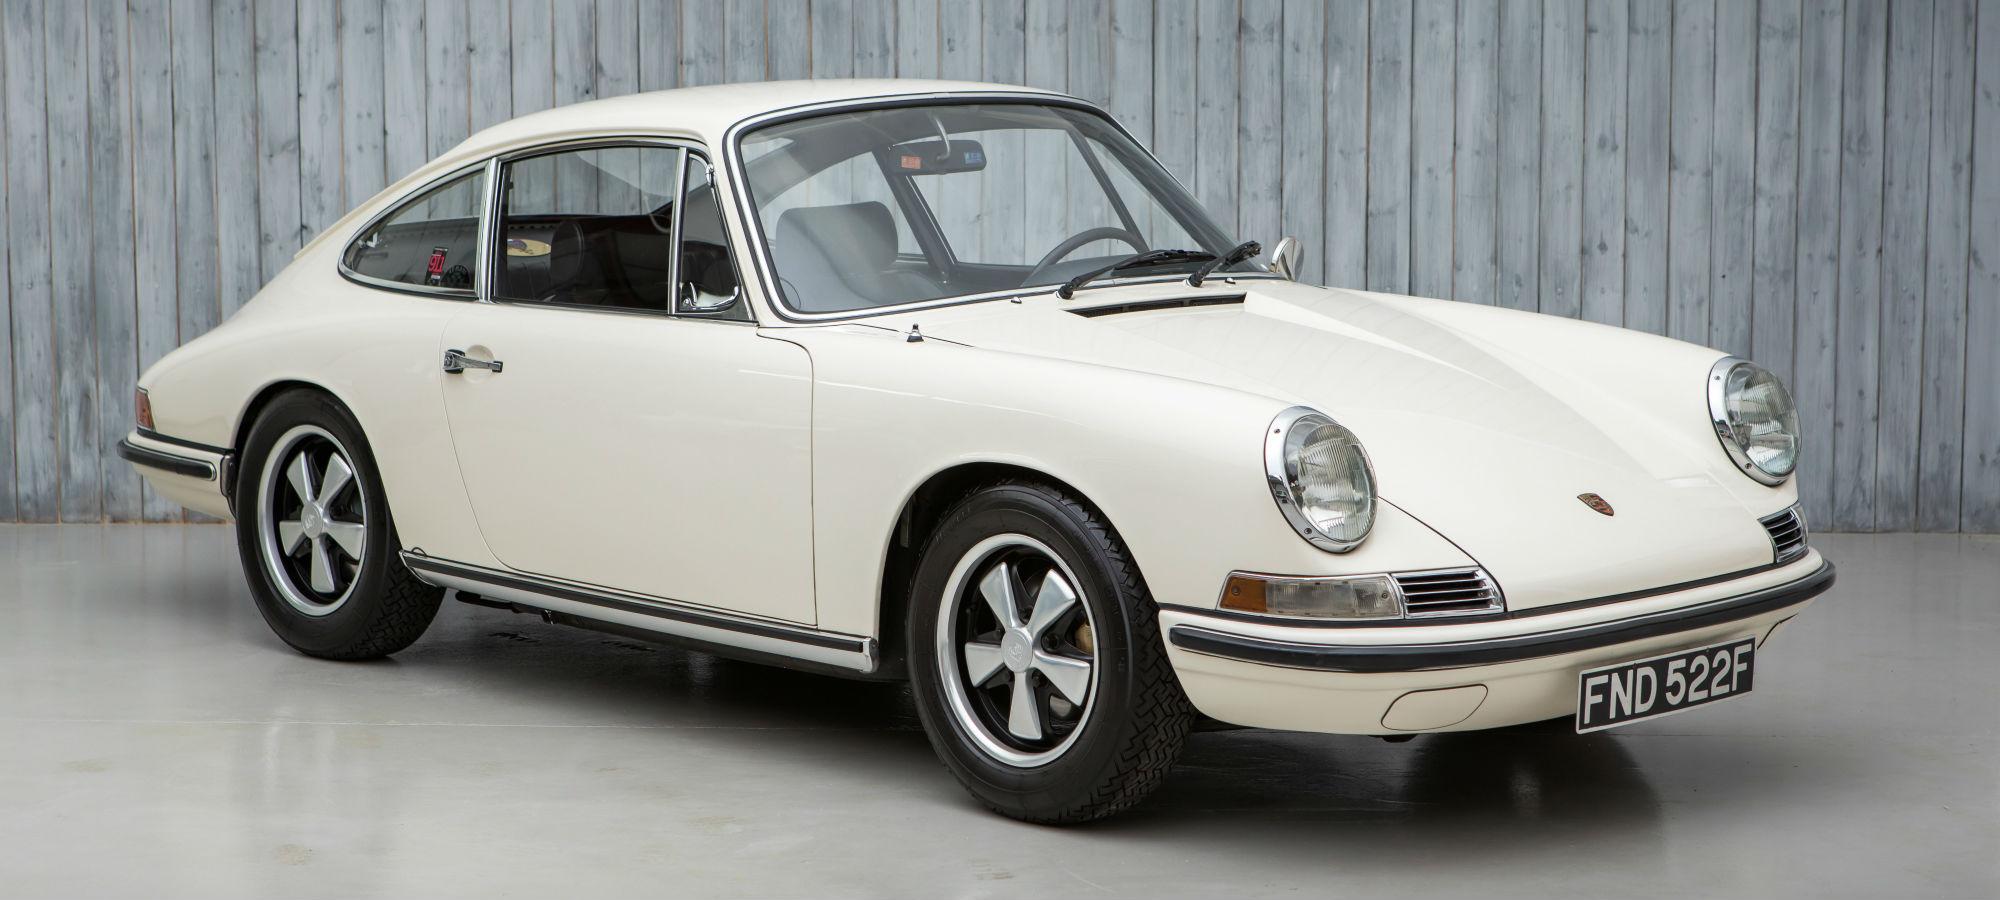 1968 Porsche 911 S 2.0 SWB